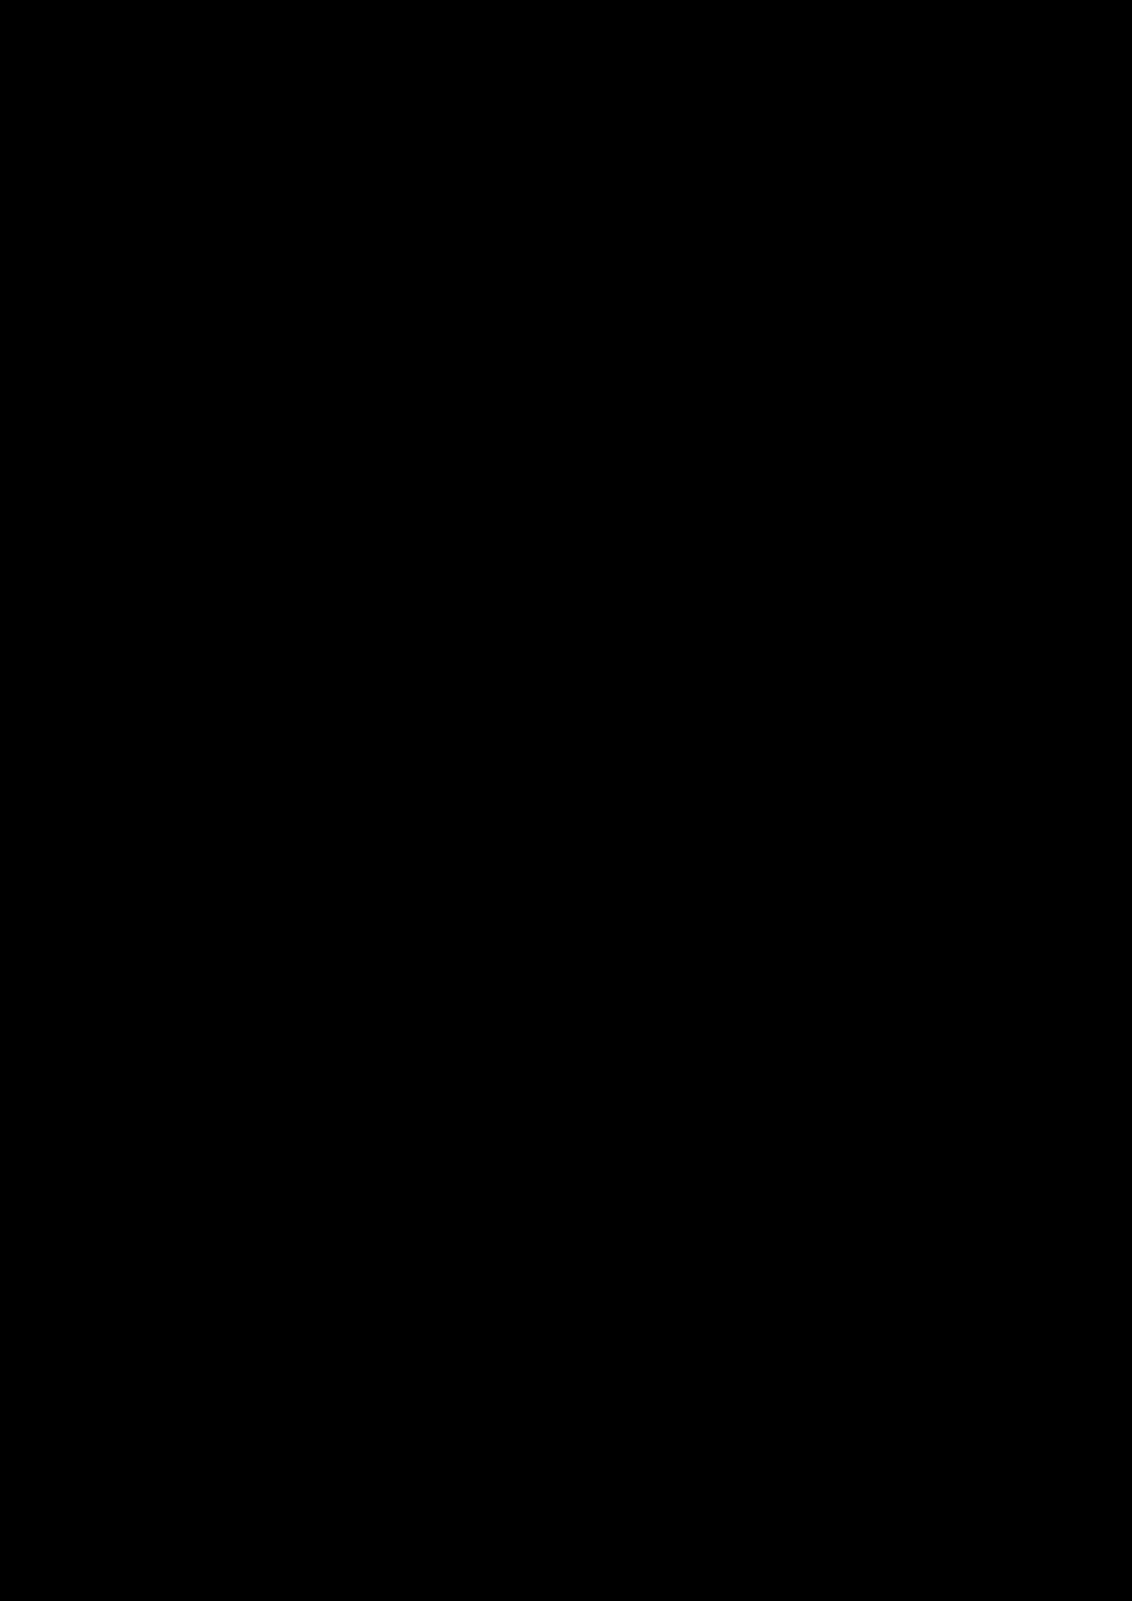 Belyiy sokol slide, Image 136